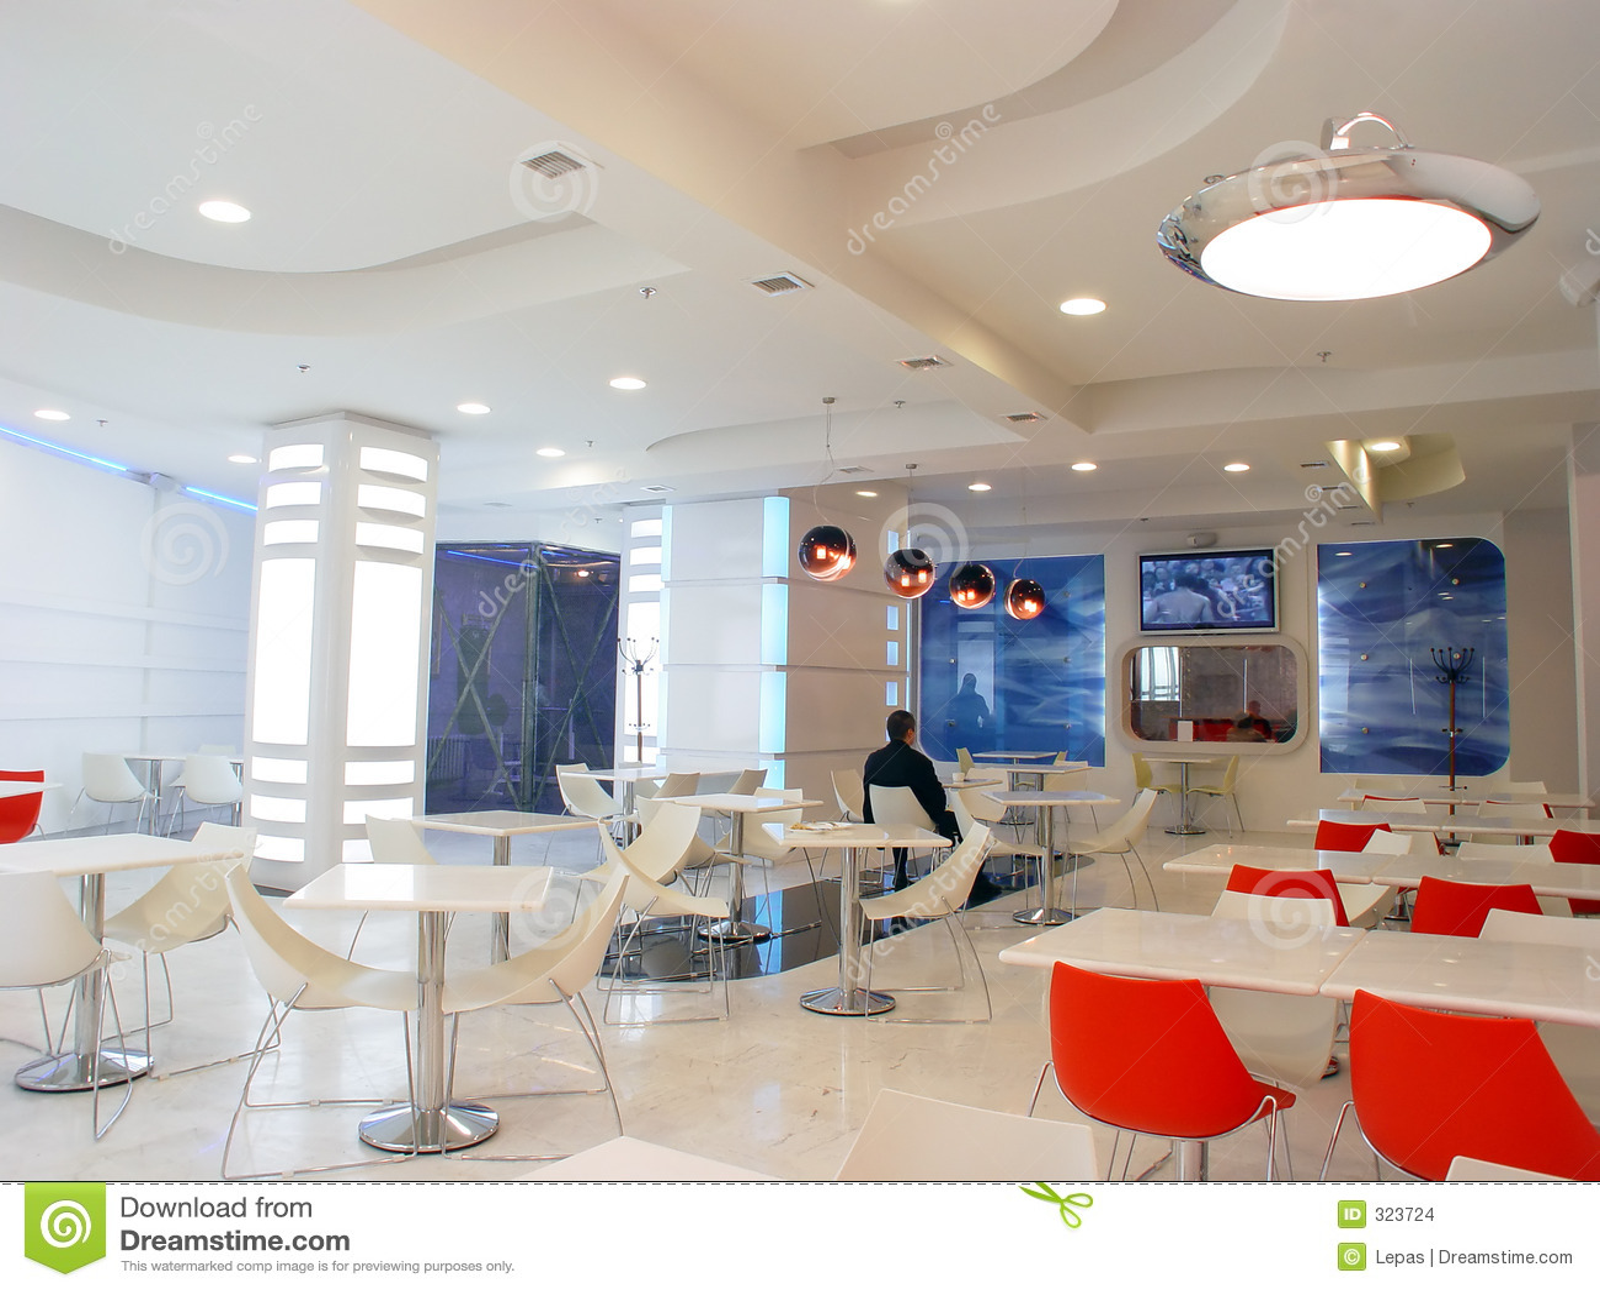 White Cafe Stock Images  Image 323724